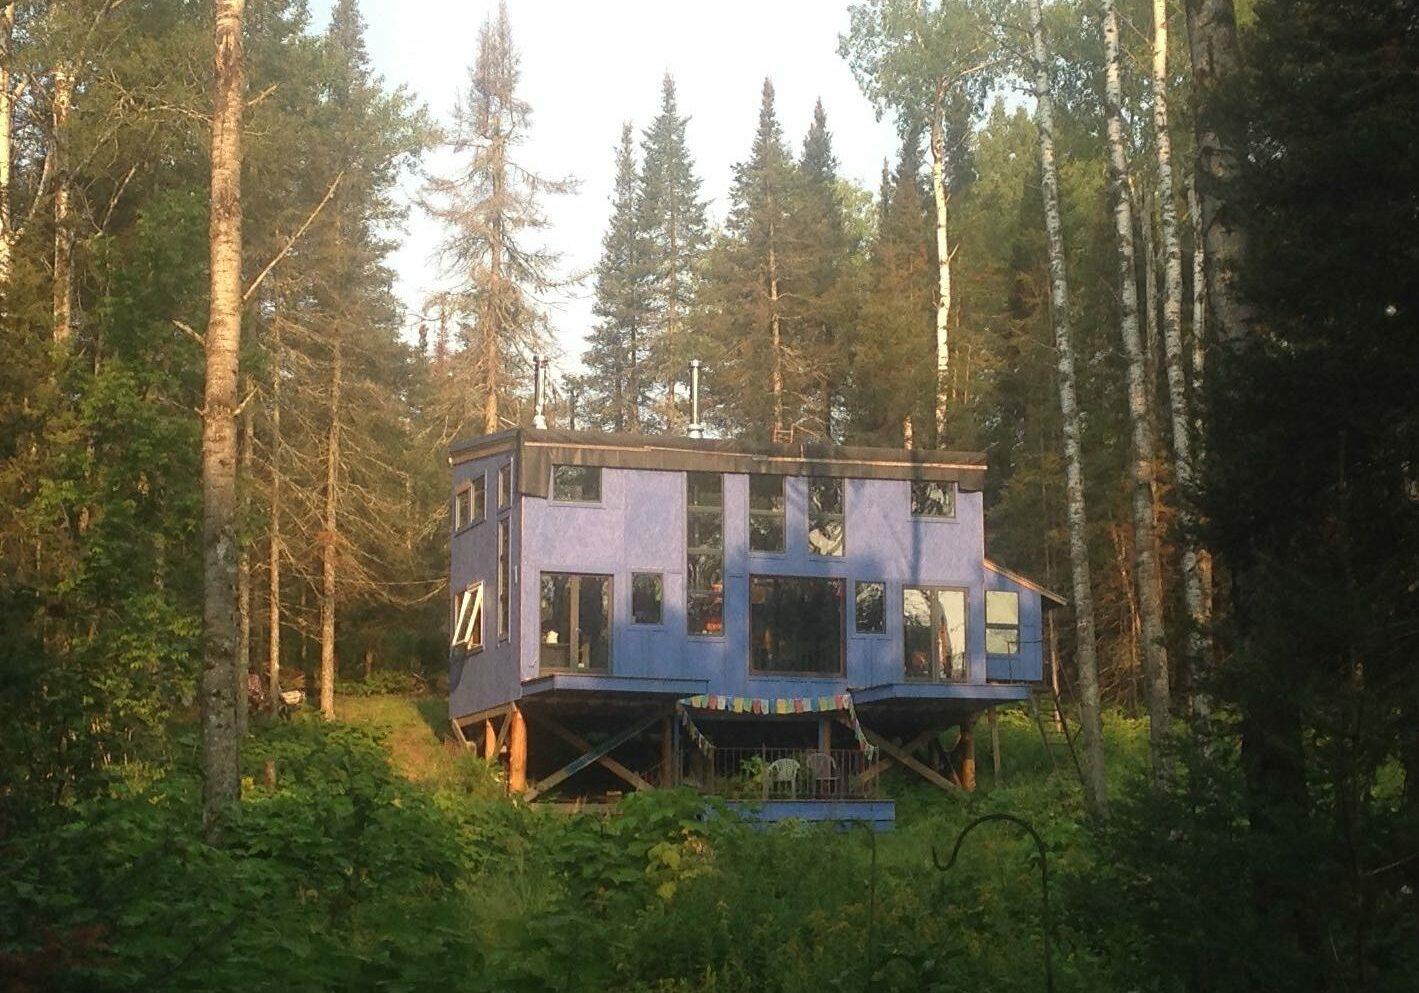 Blauhaus (Blue House)